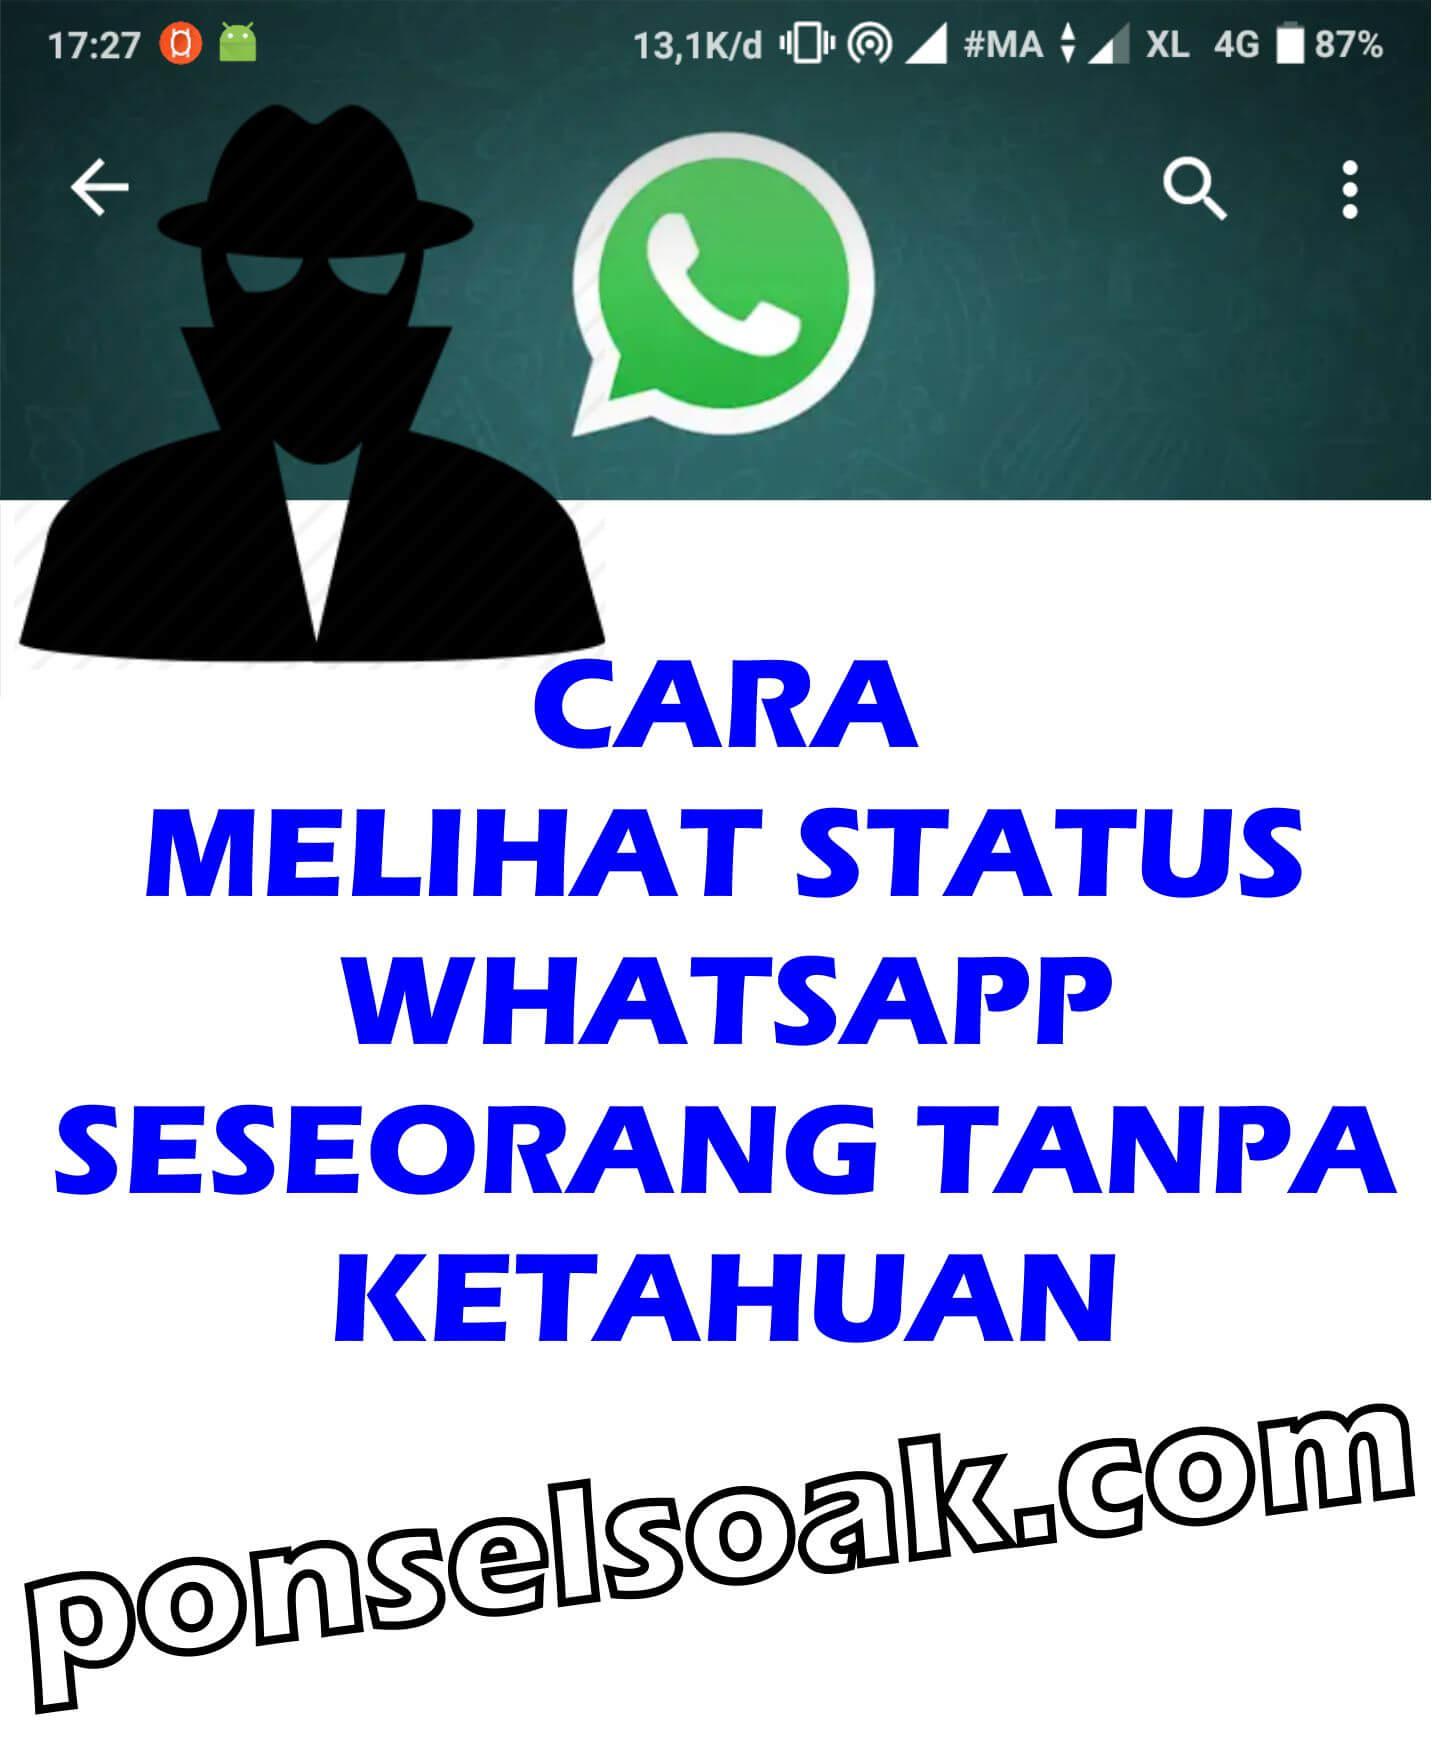 Cara Melihat Status WhatsApp Seseorang Tanpa Ketahuan